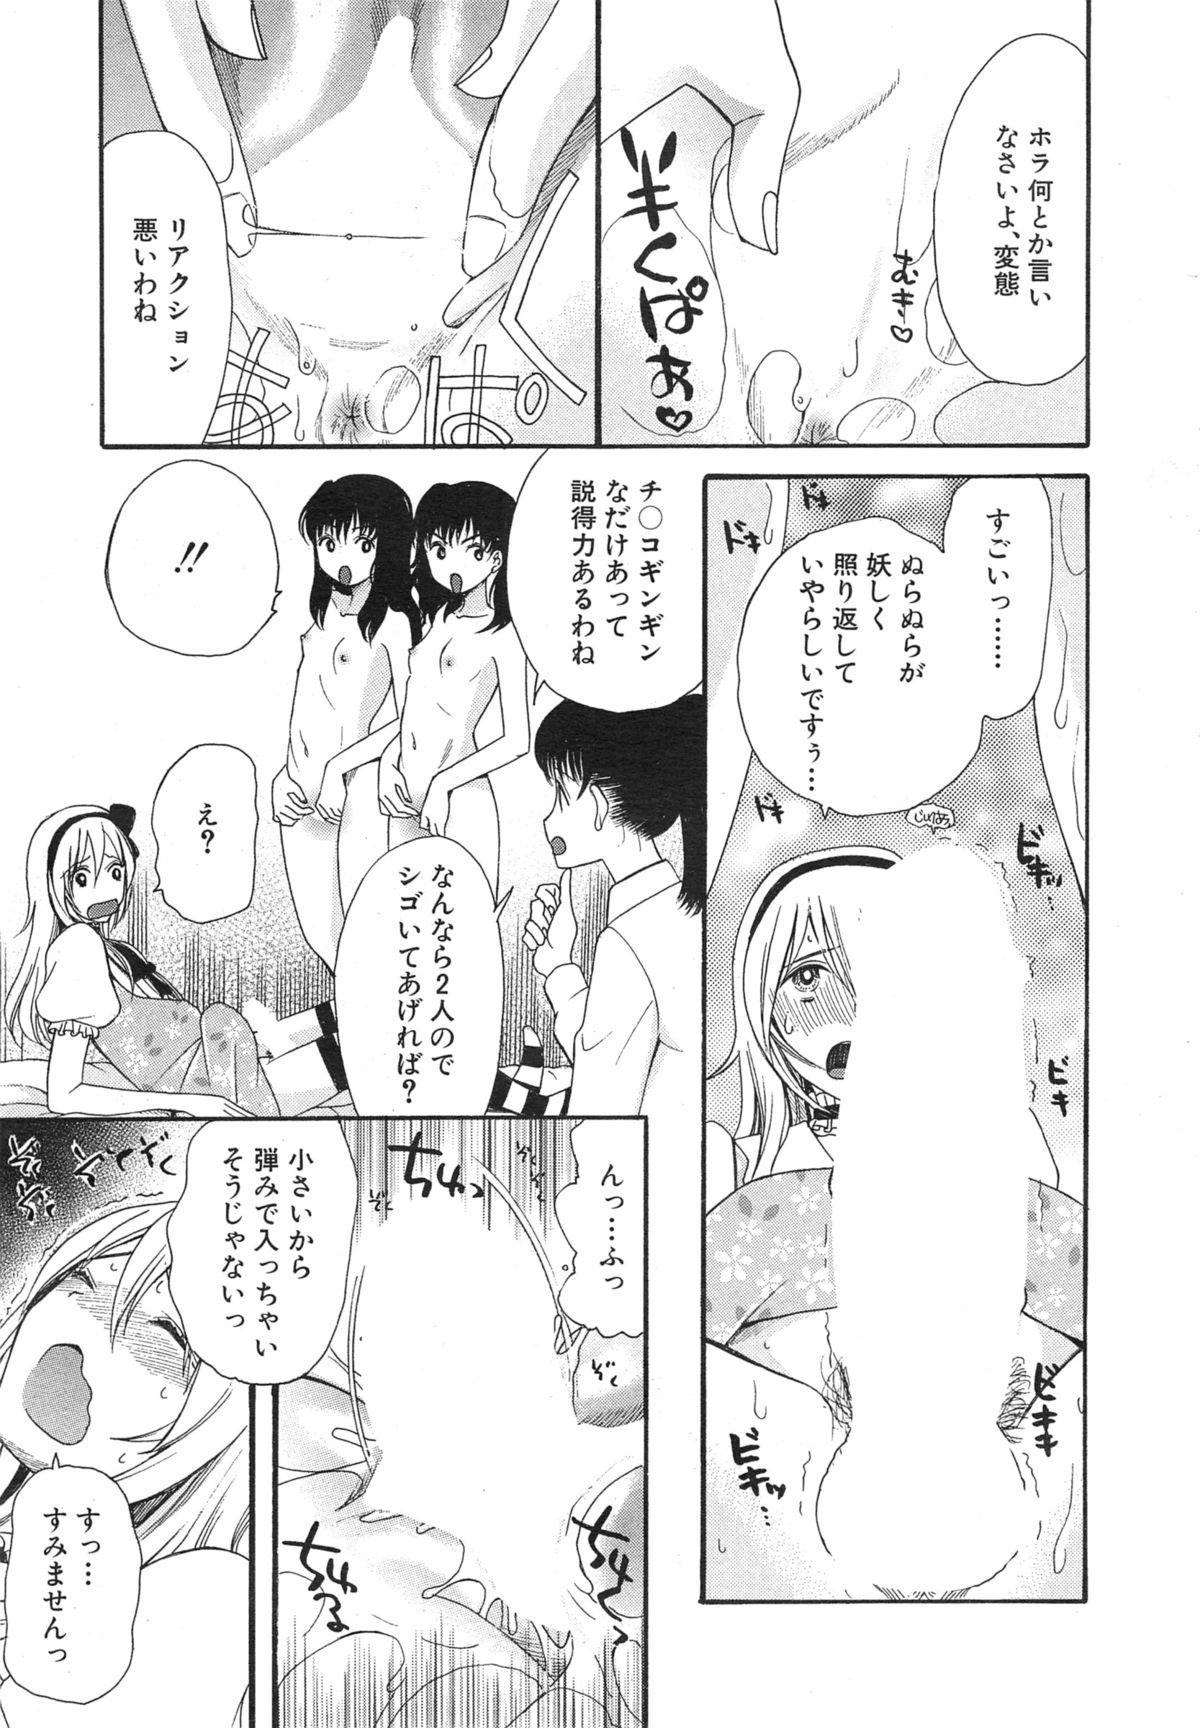 Kawaiku Natte Omocha ni Natte 16